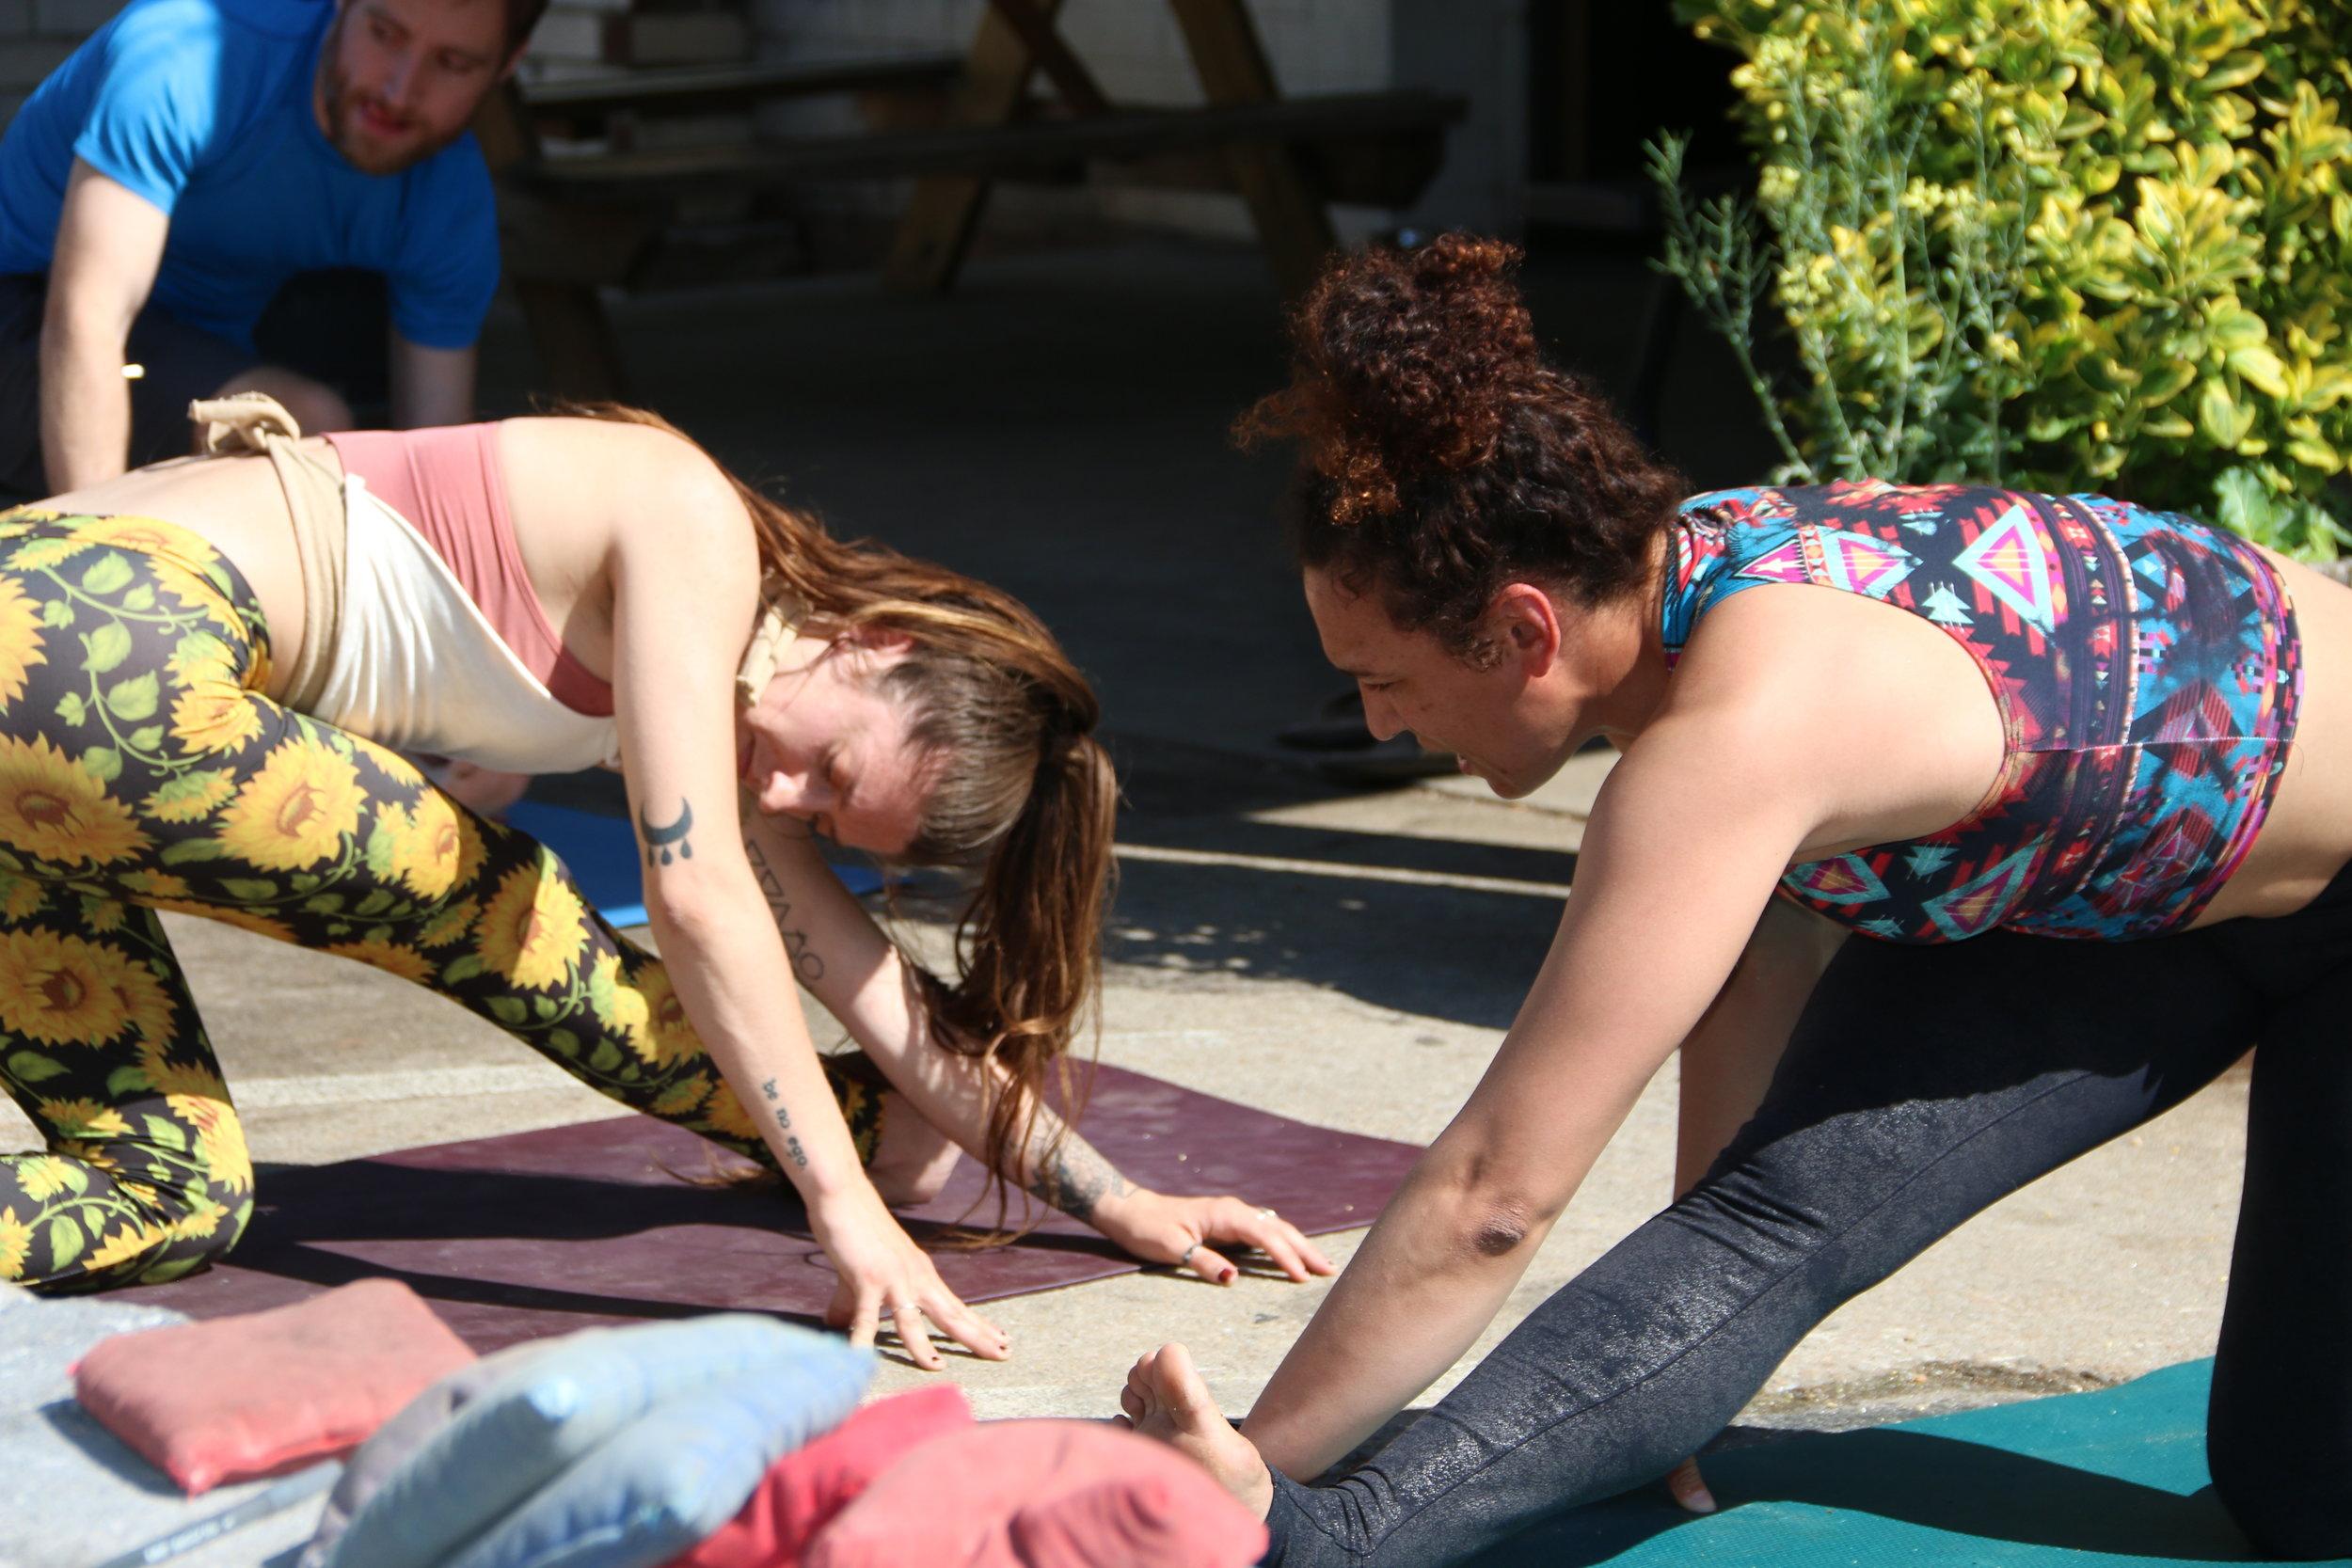 Cici and Erica co-teaching an outdoor yoga class